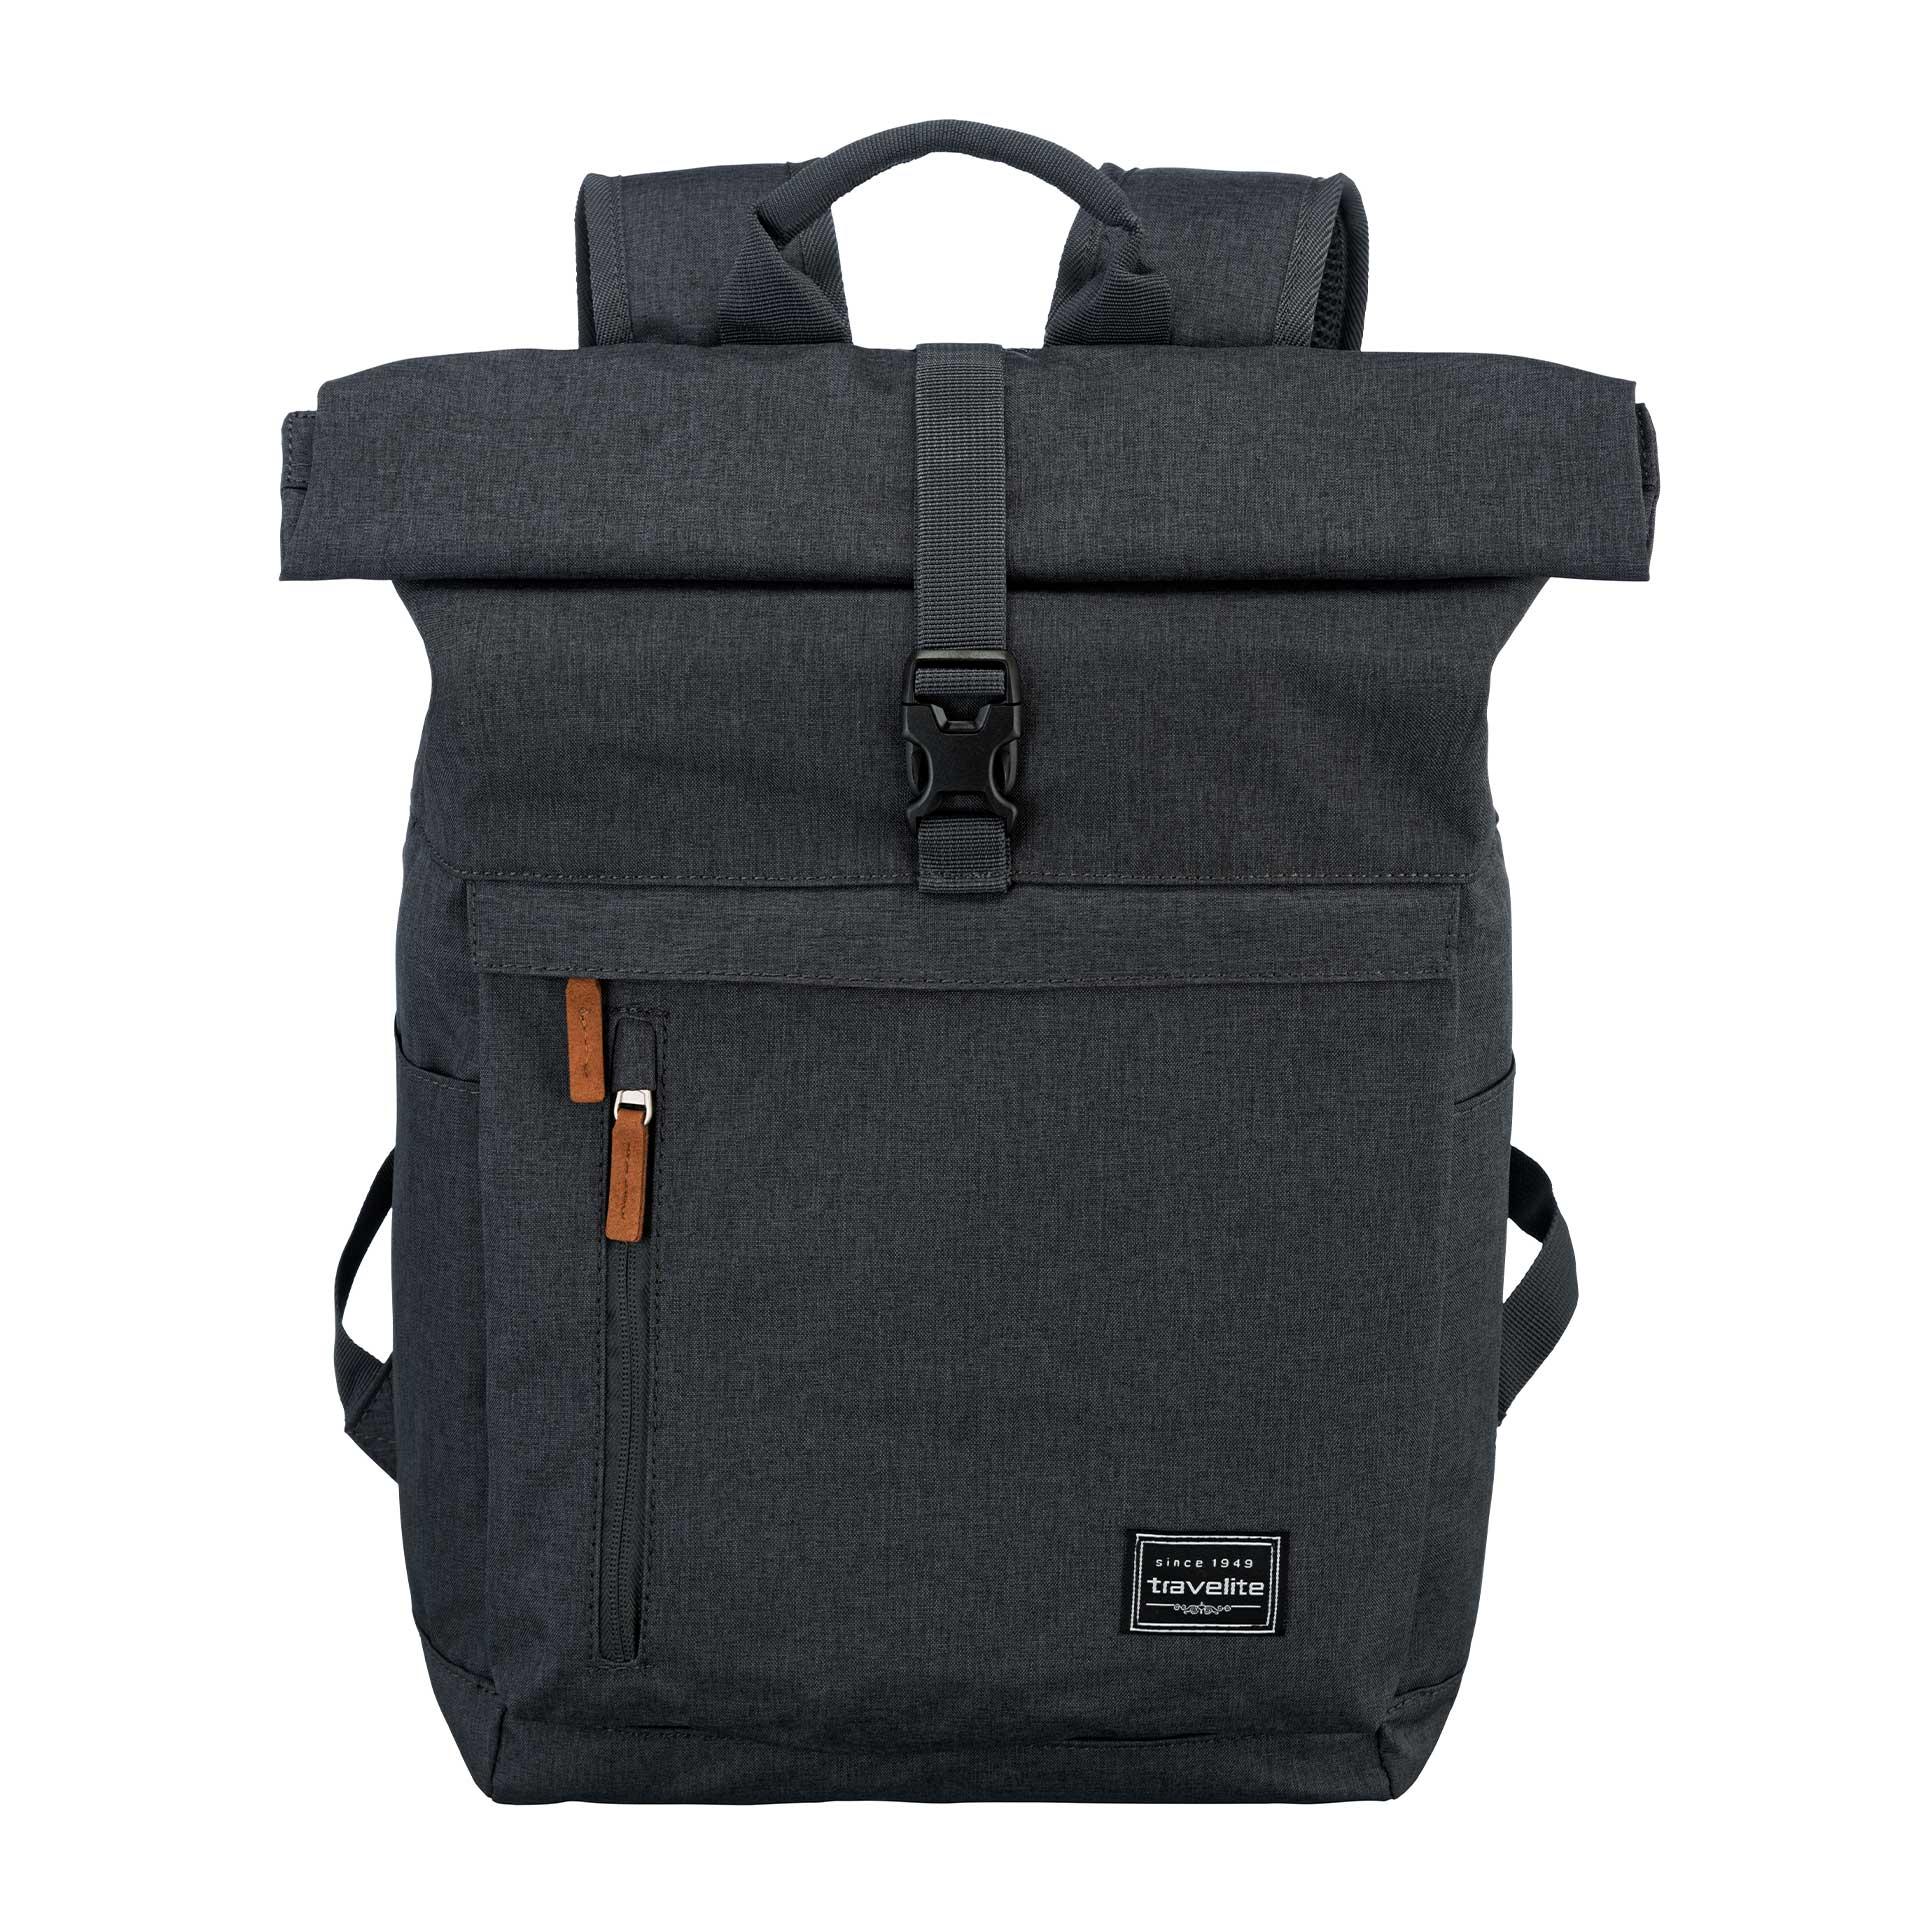 travelite. Basics Rollup Rucksack